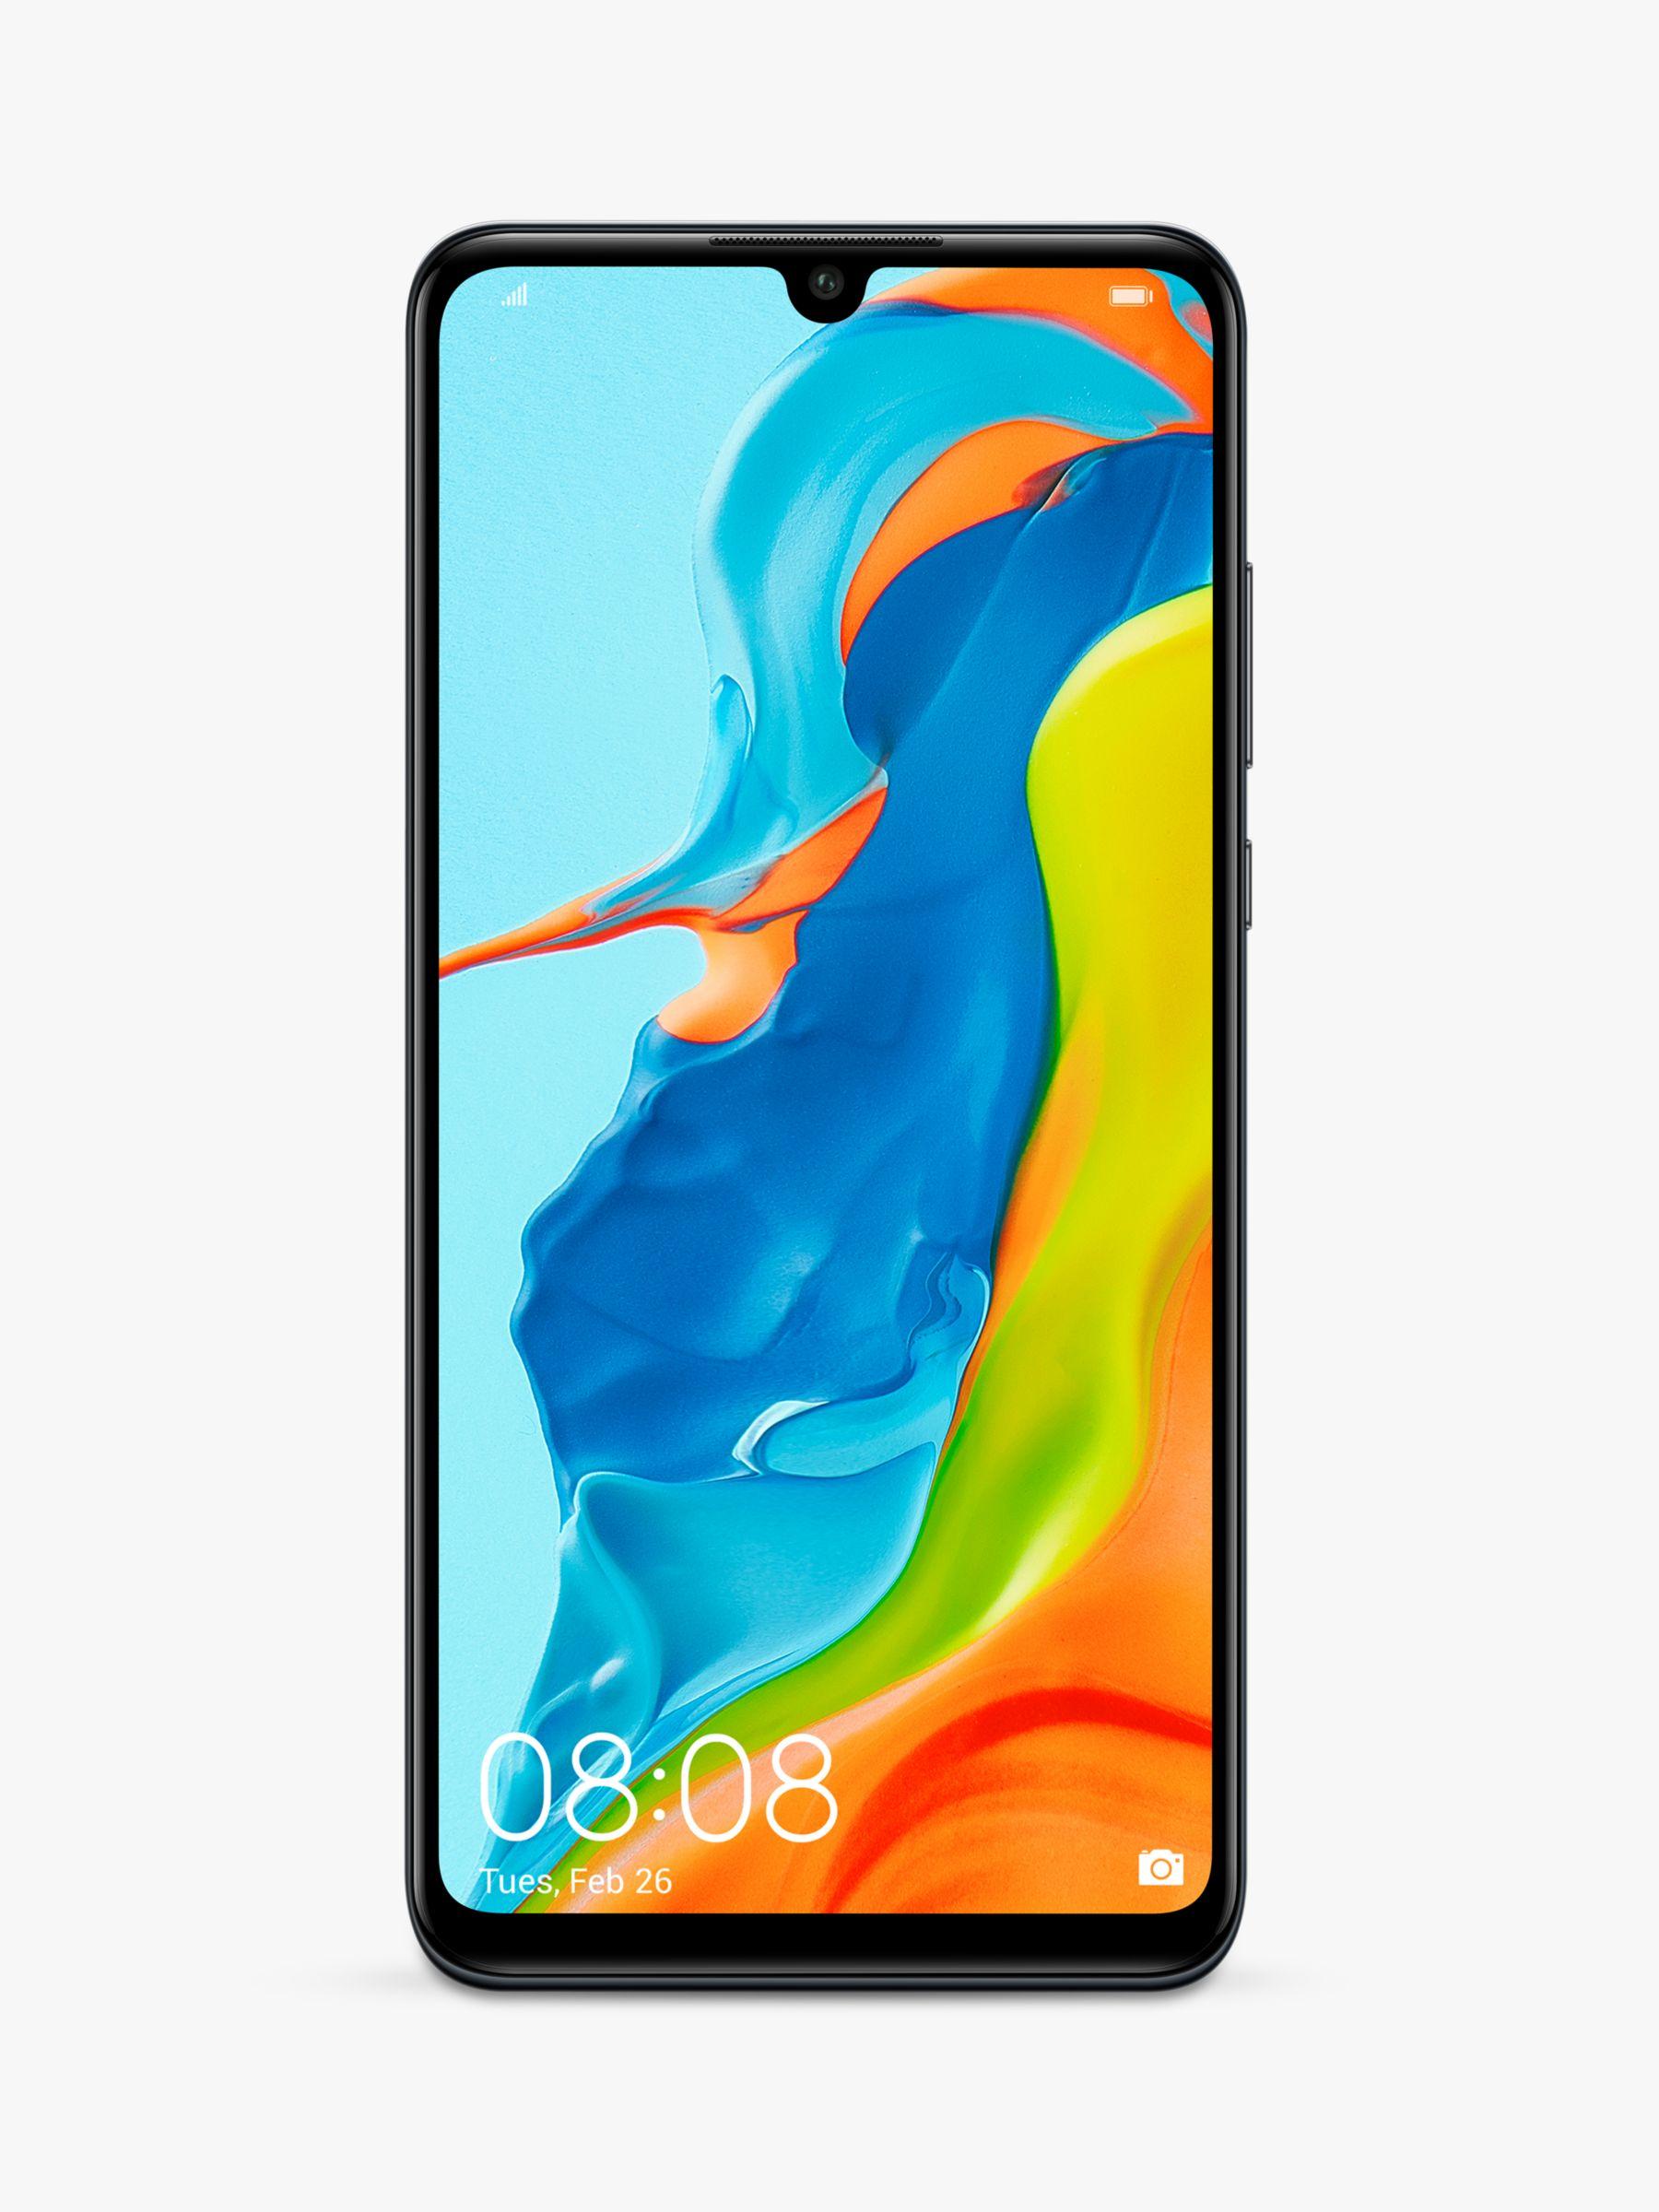 "Huawei Huawei P30 Lite Smartphone, Android, 4GB RAM, 6.15"", 4G LTE, SIM Free, 128GB"